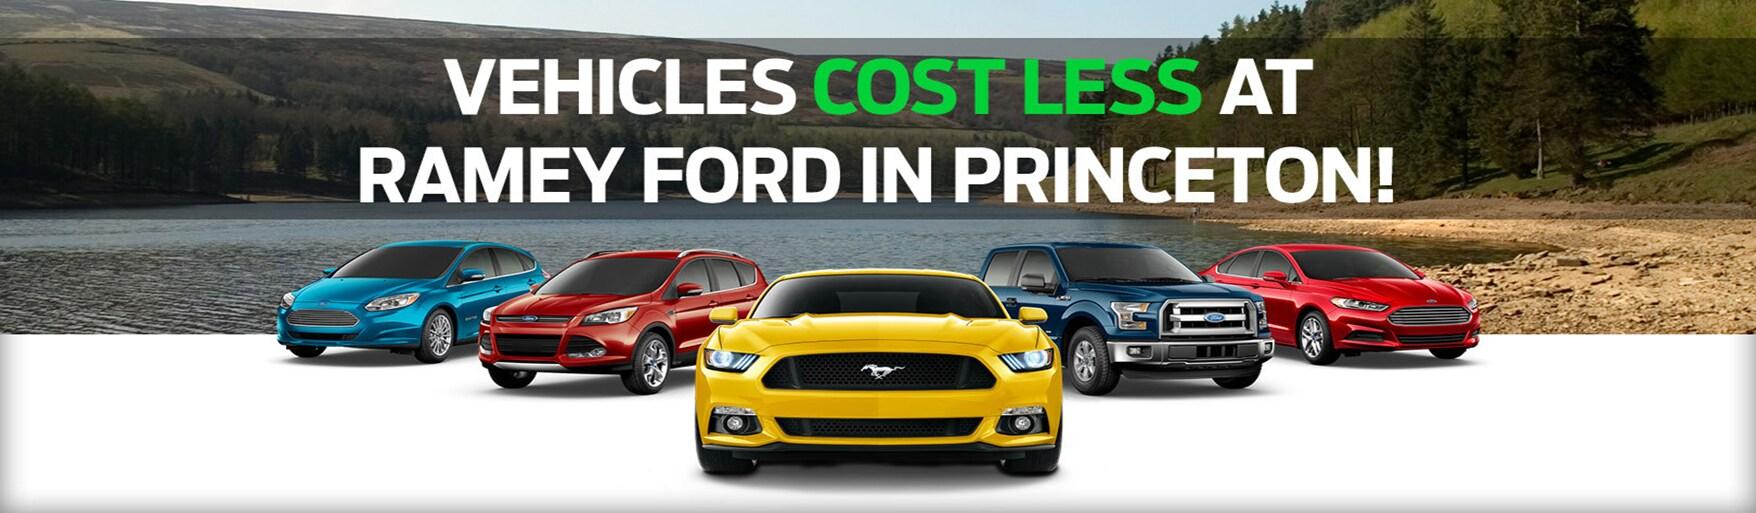 Ramey Ford Princeton | New U0026 Used Ford Dealership | Princeton, WV